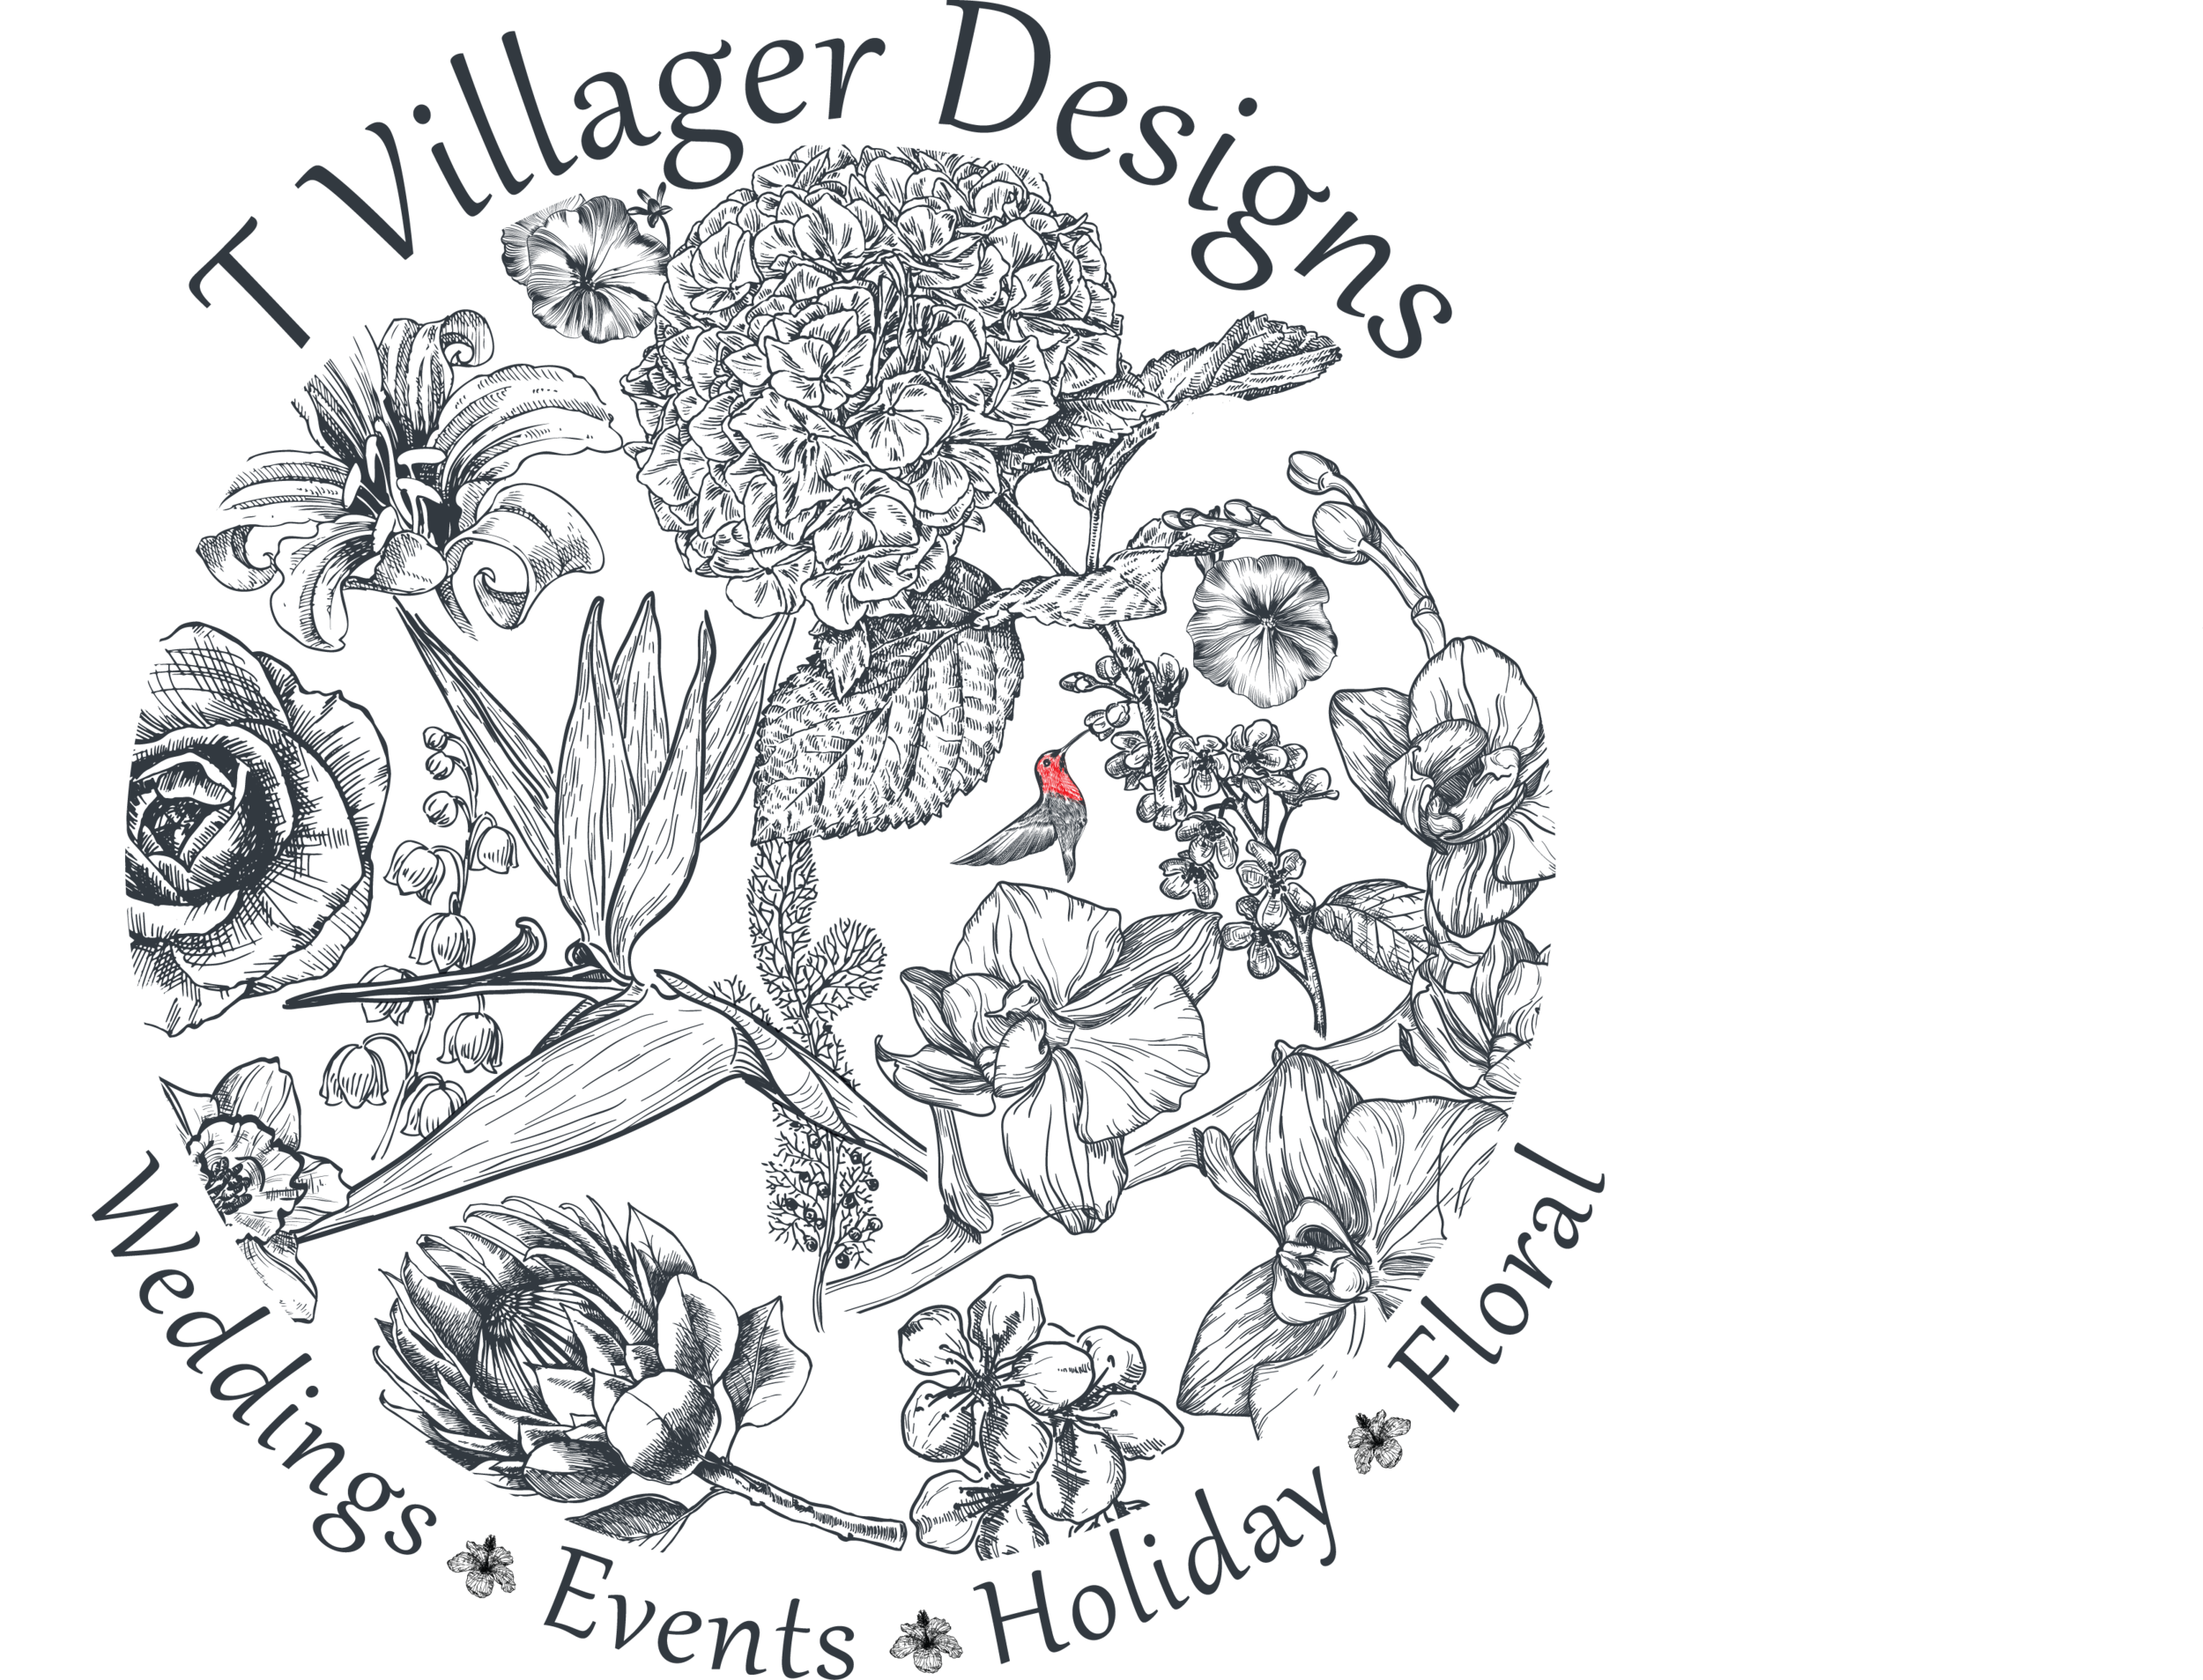 T Villager Logo Dark.png